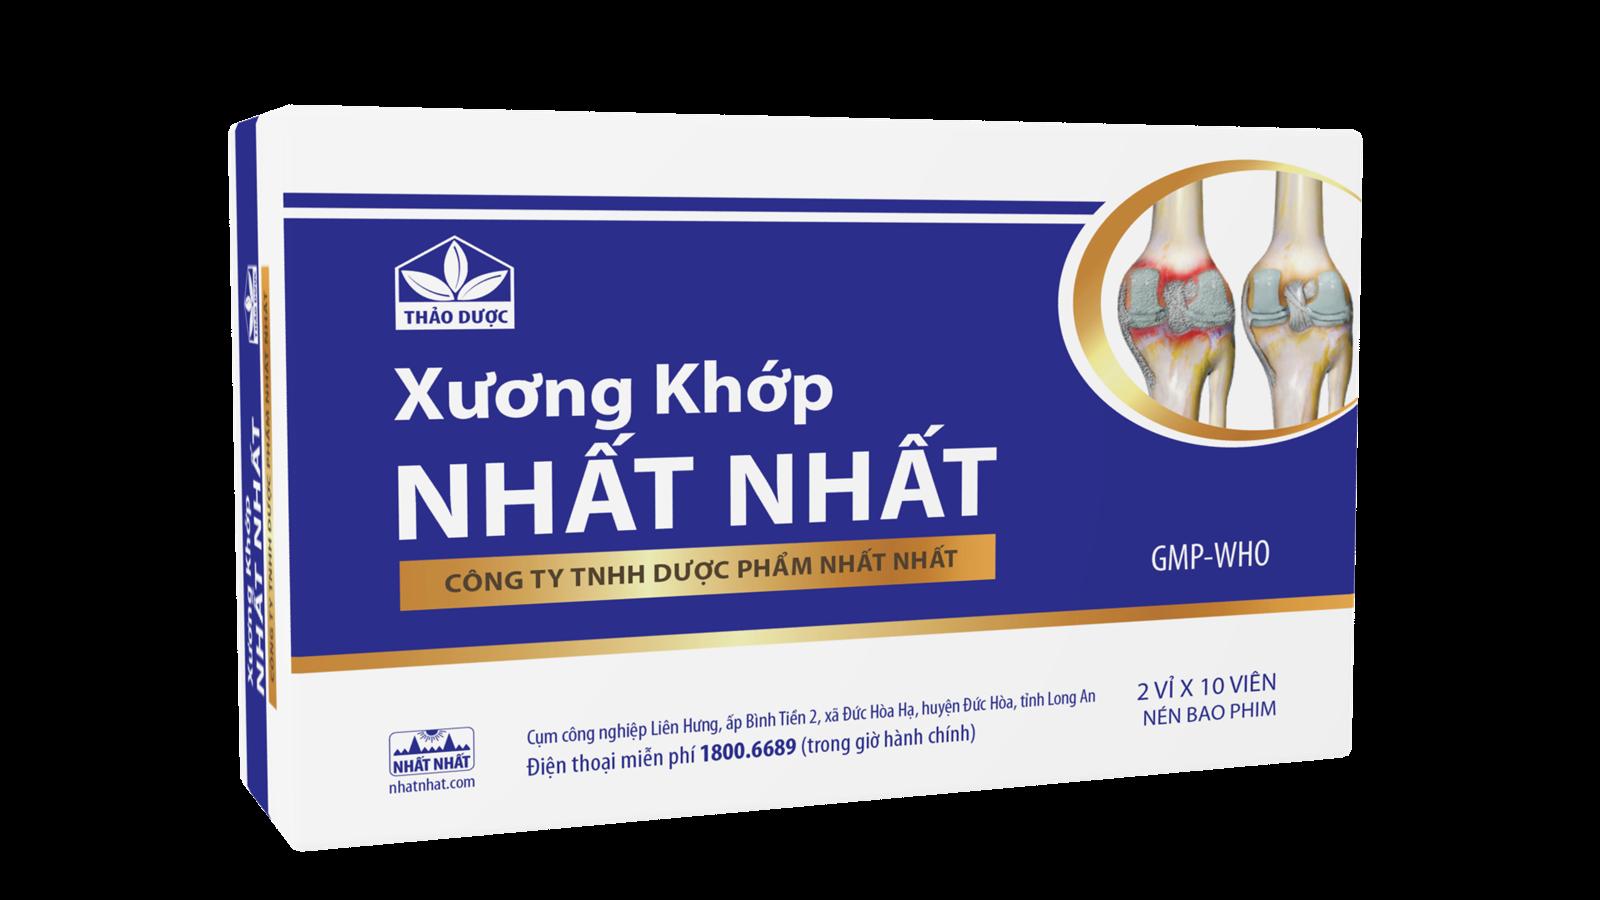 tpcn-xuong-khop-nhat-nhat-co-cong-dung-gi-1